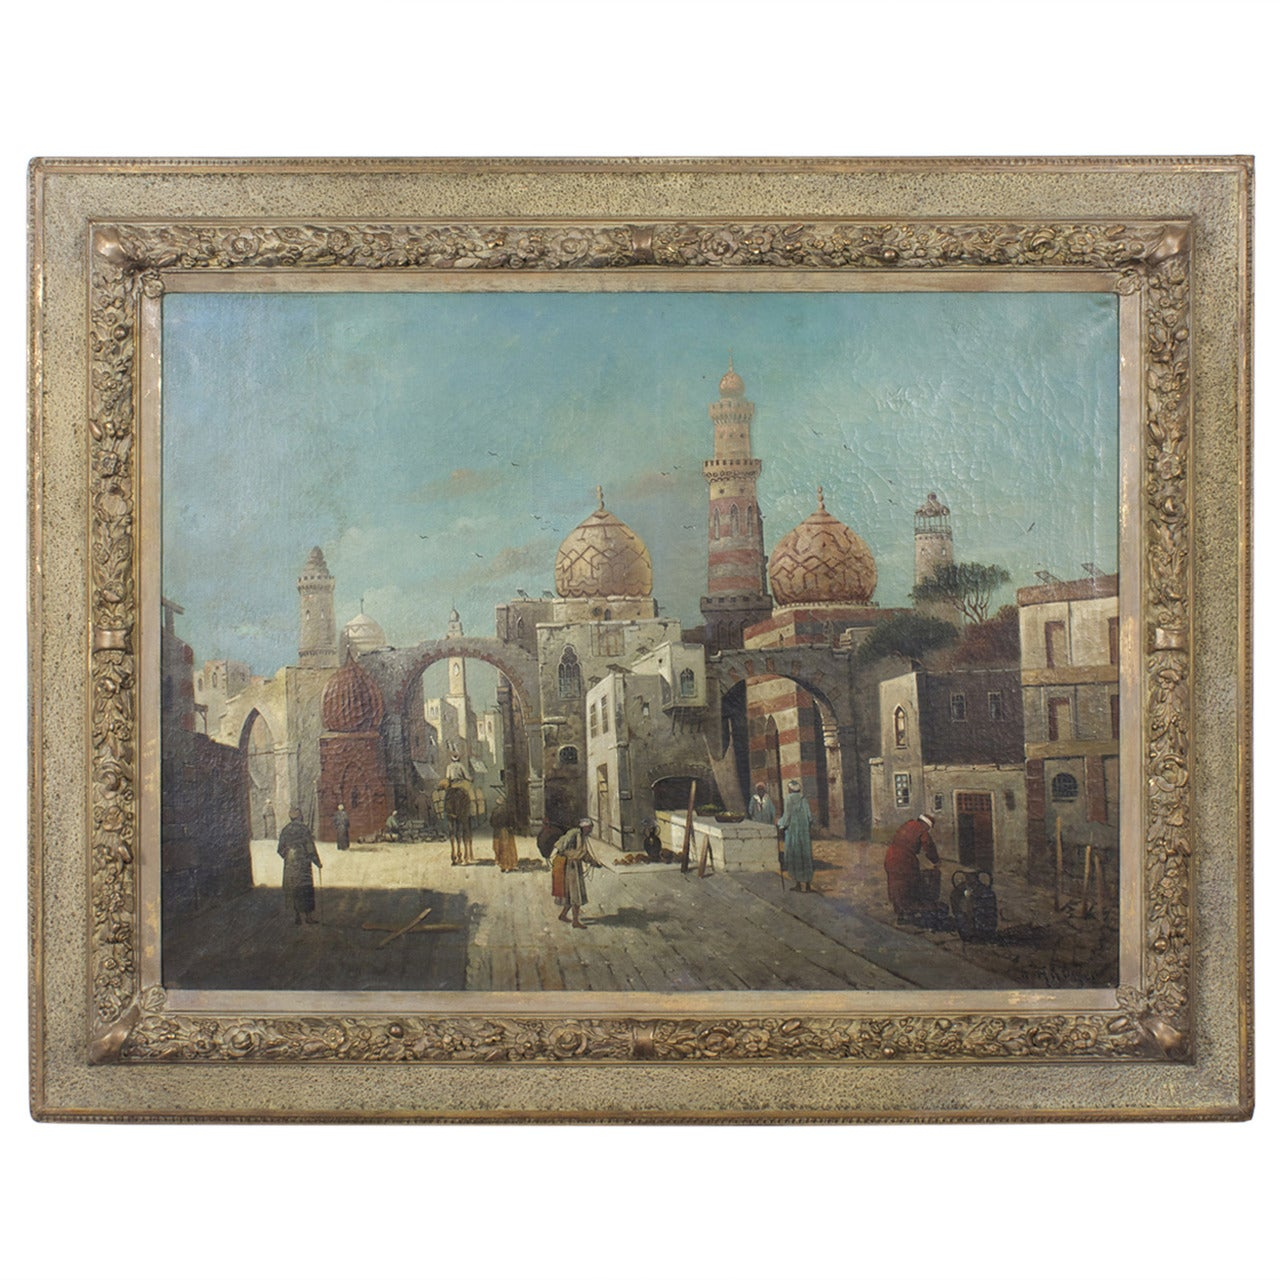 19th Century Orientalist Oil on Canvas Painting